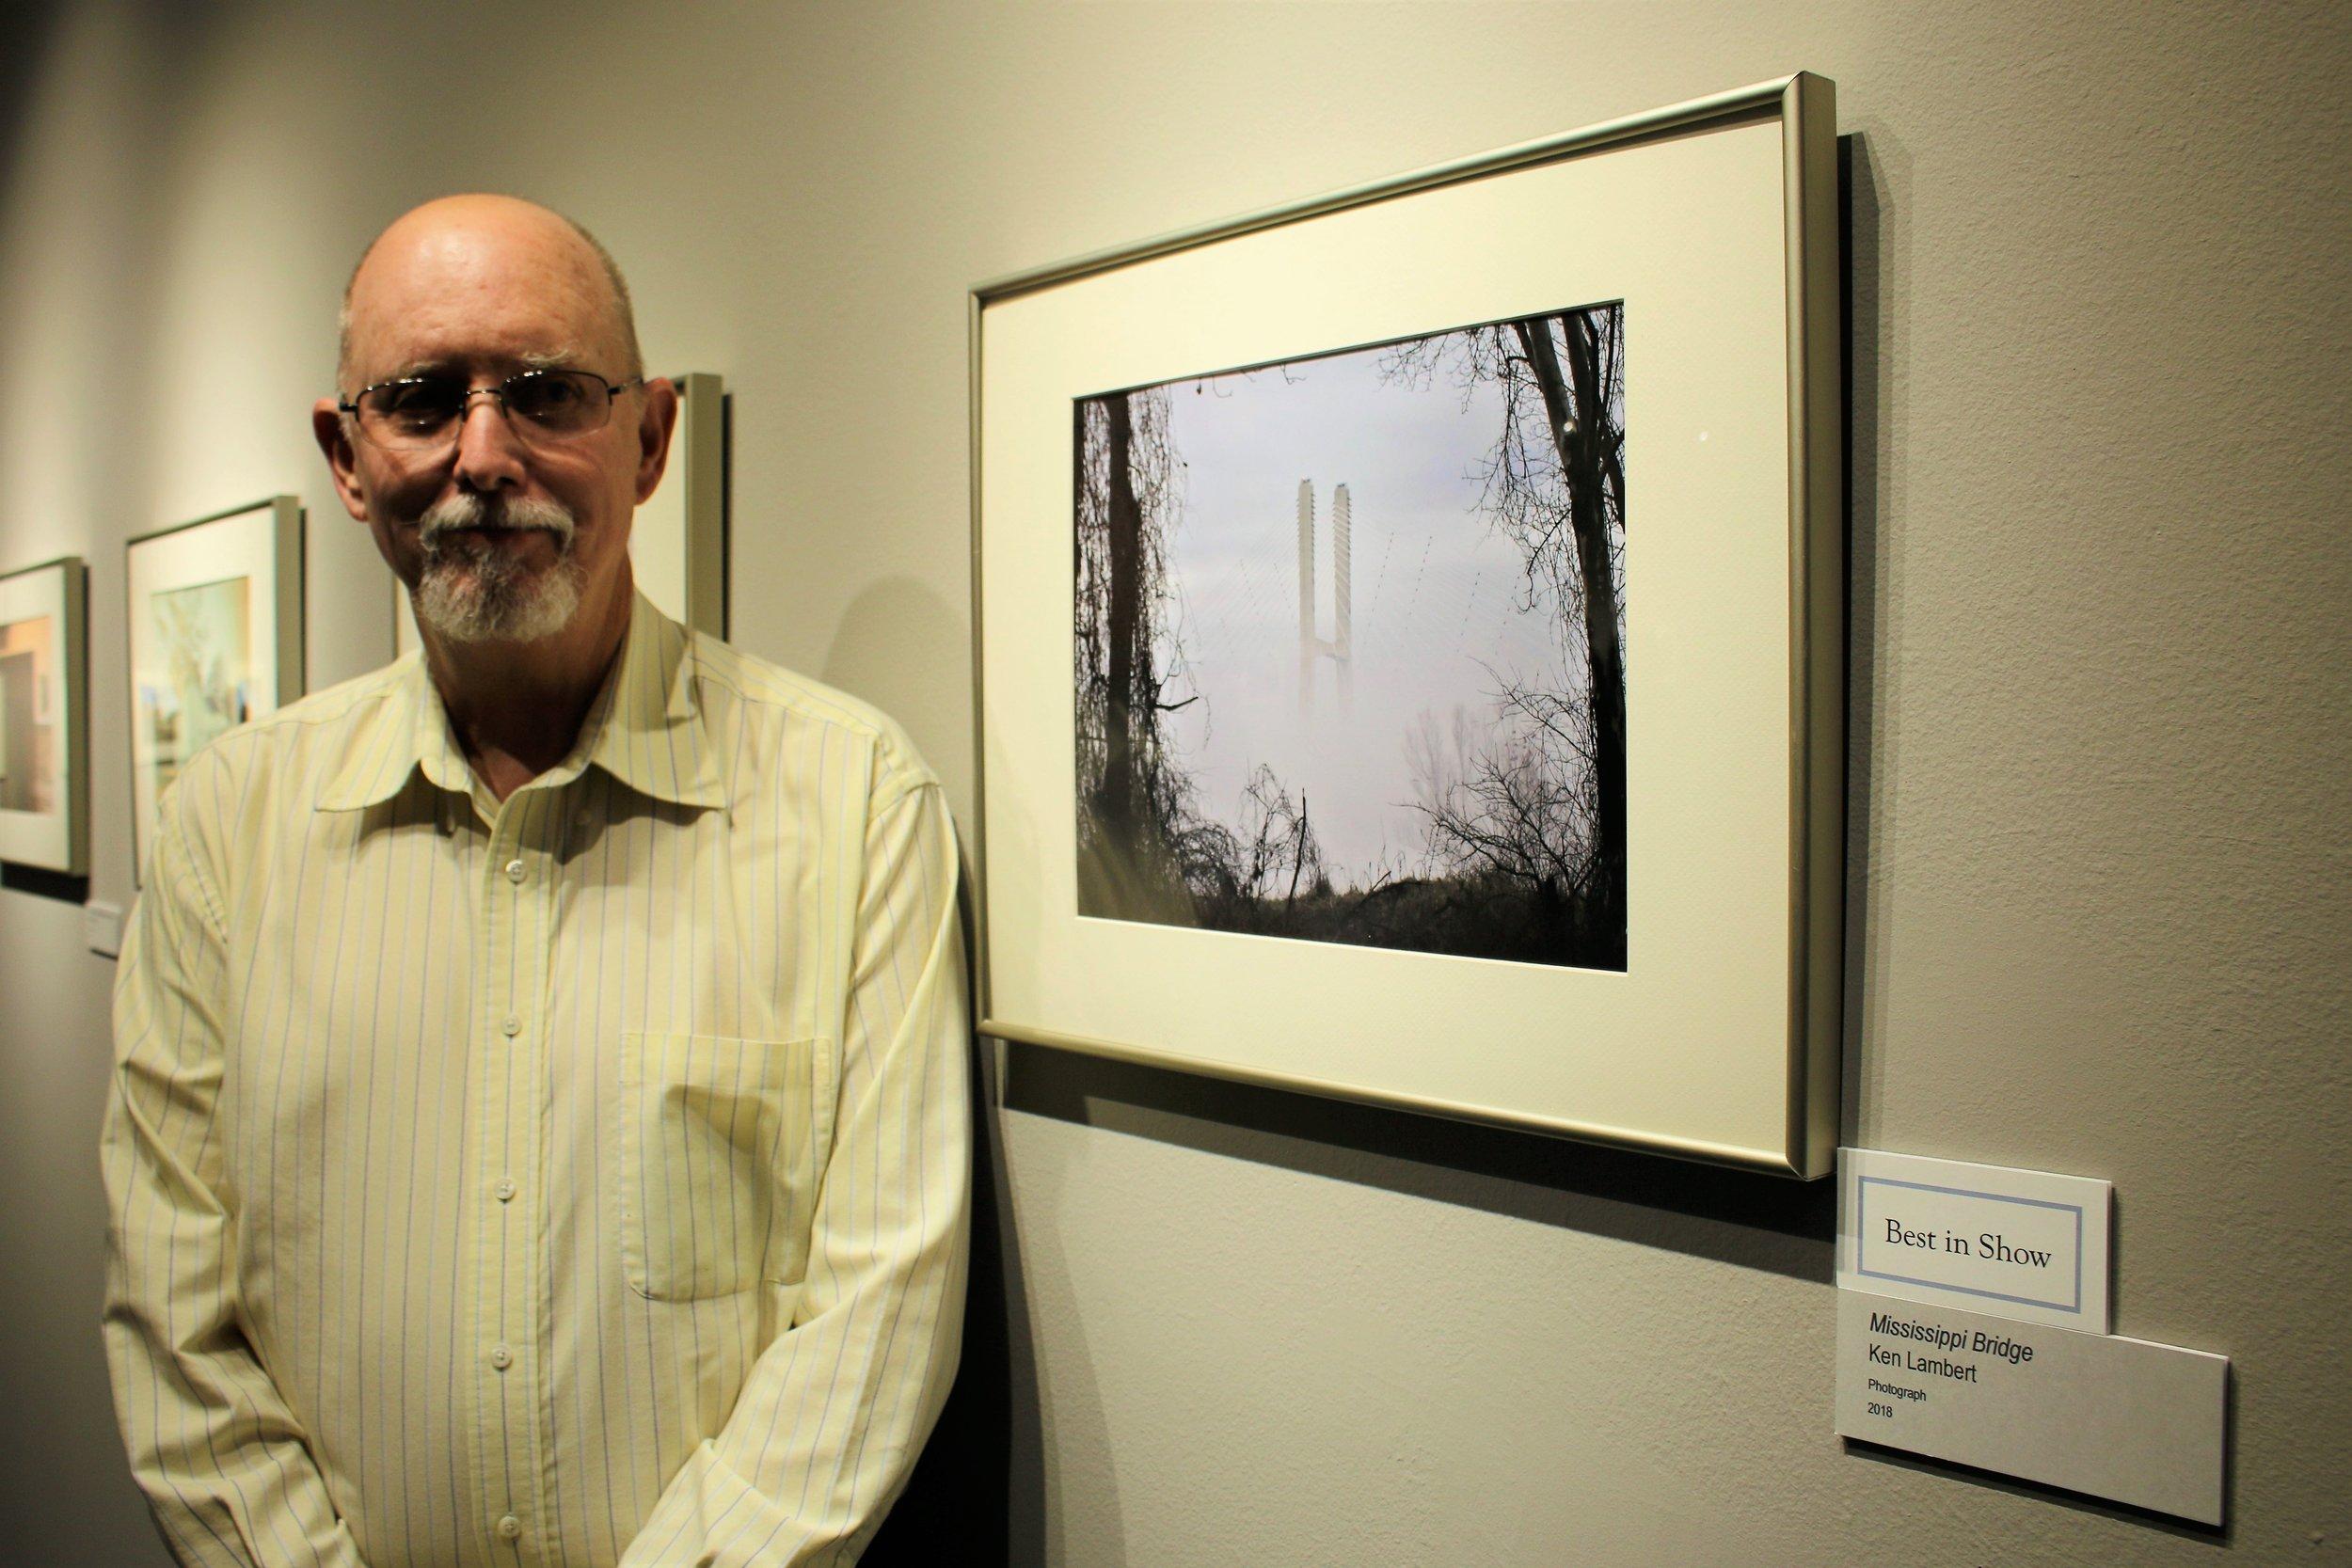 Ken Lambert, his photo Mississippi River took Best in Show.JPG